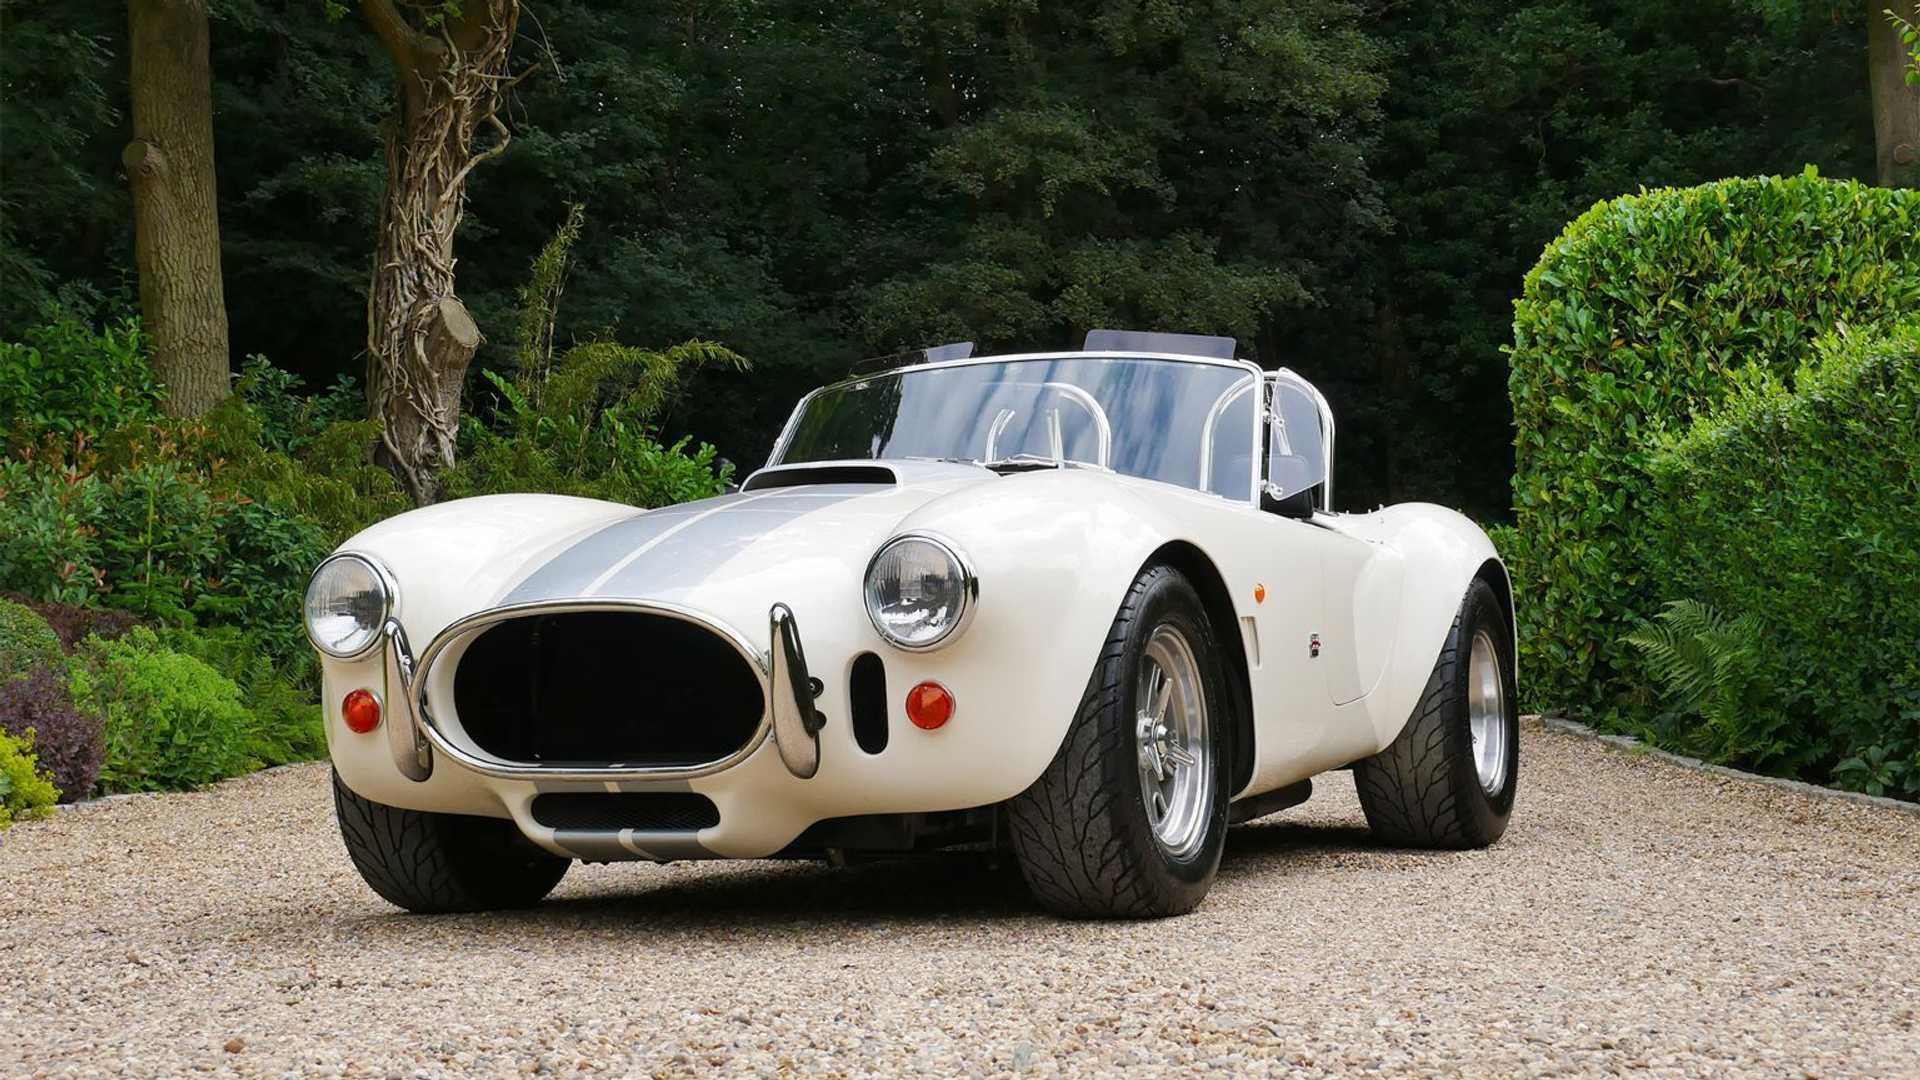 AC Cobra reborn with a 6.2 V8, £130k price tag